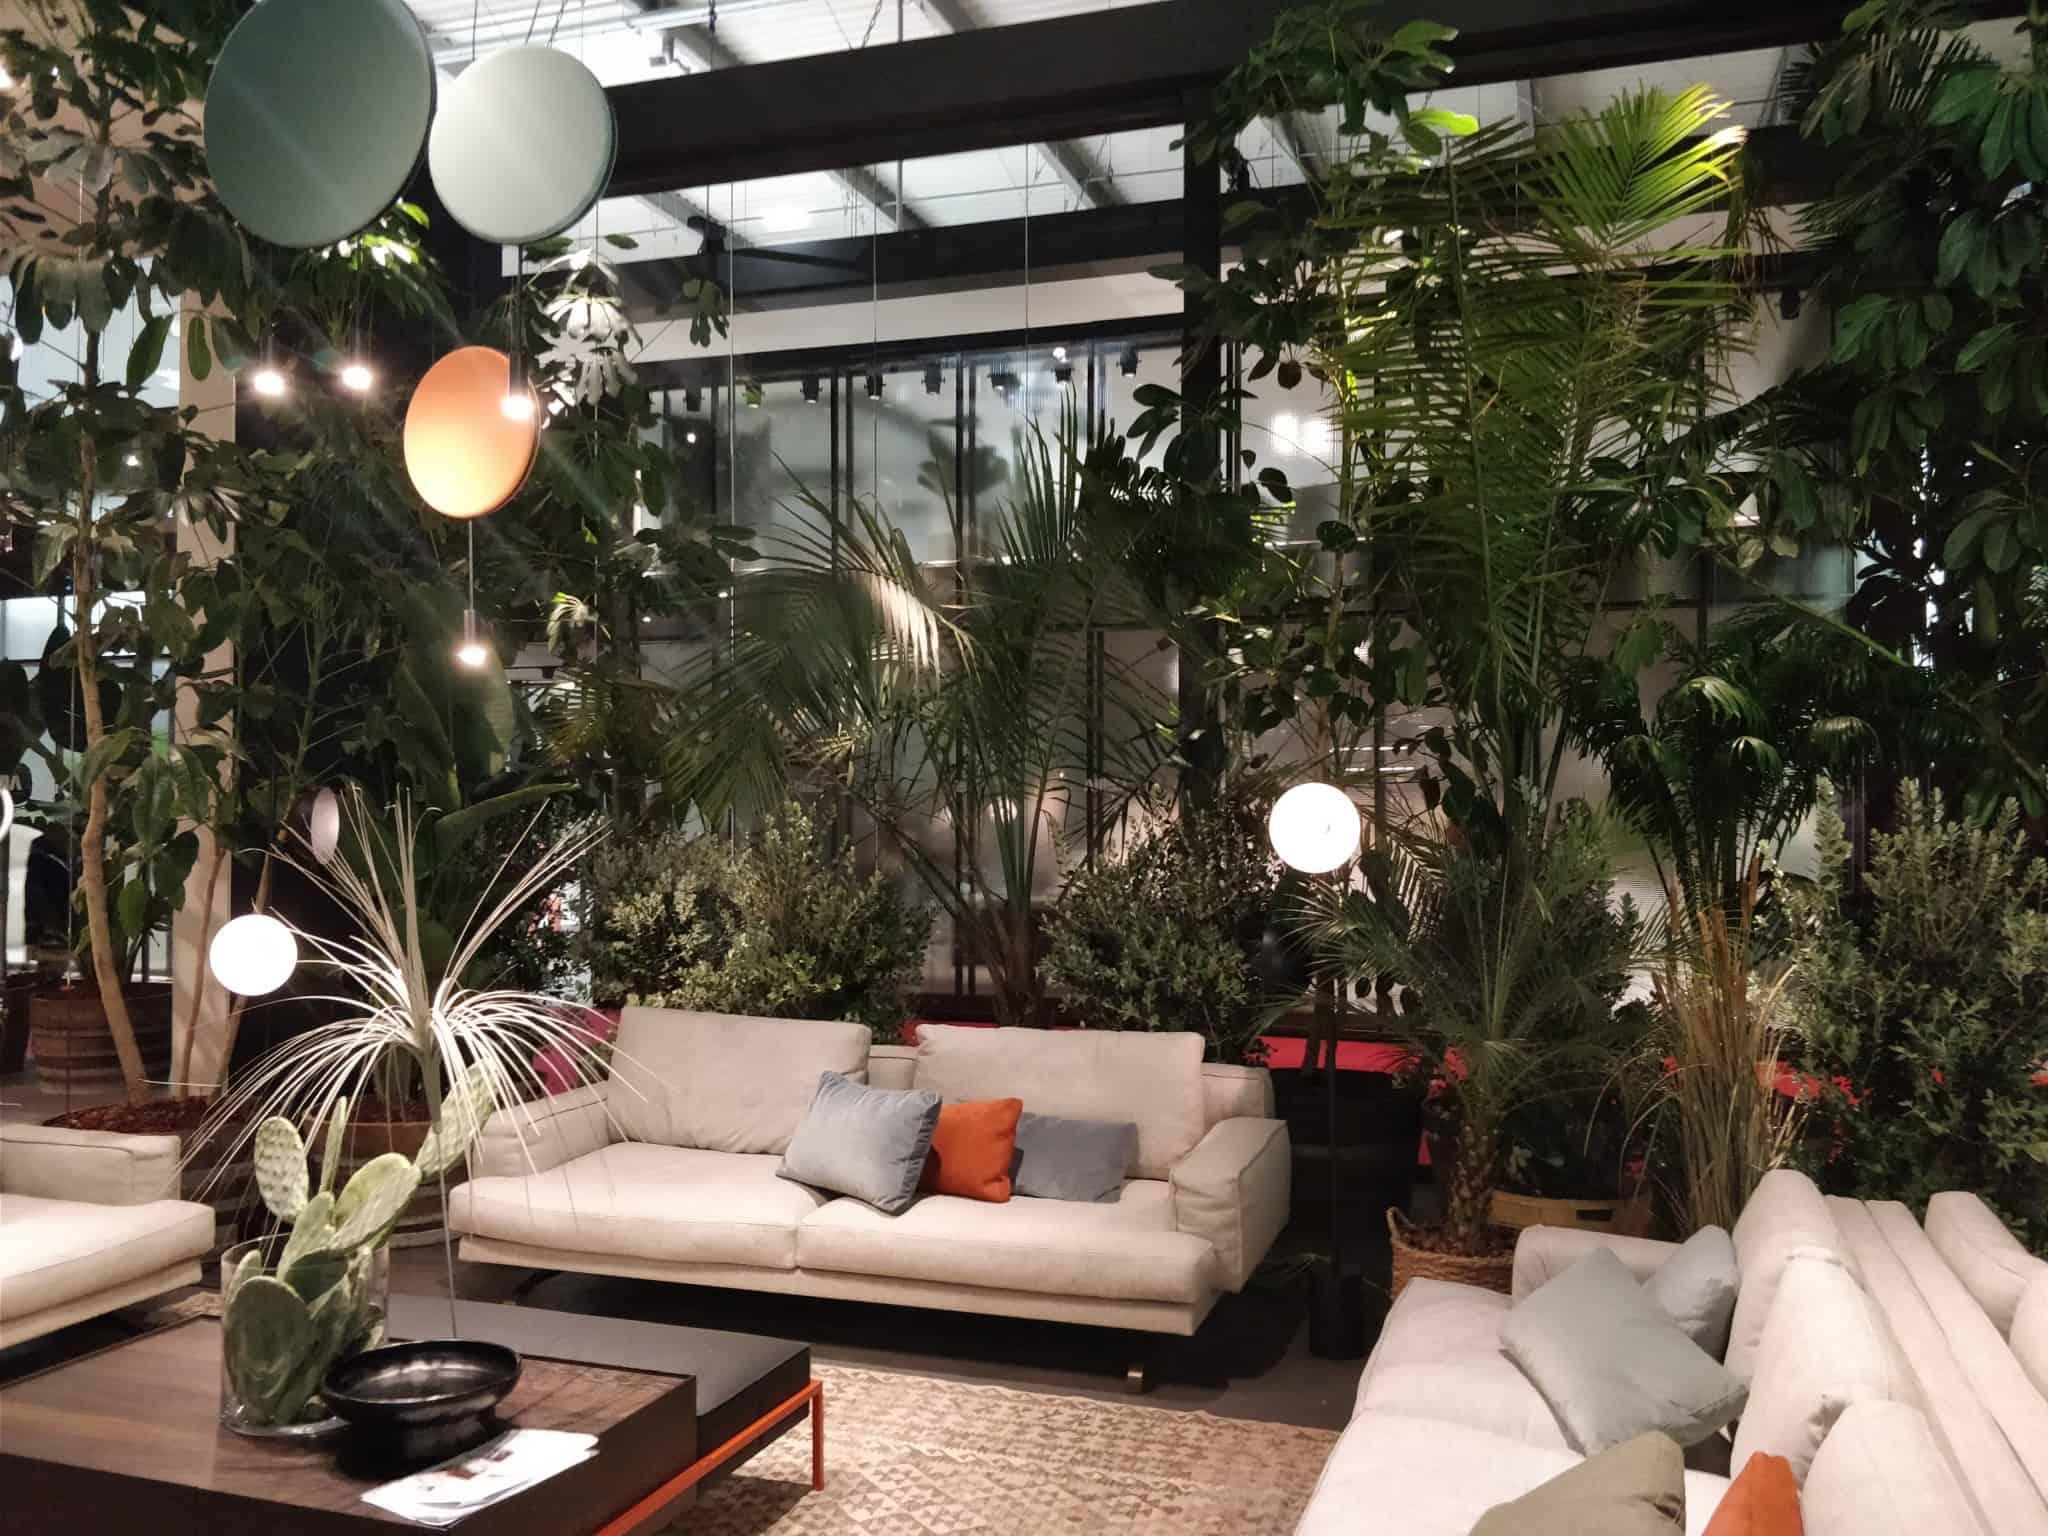 Trend spotting at Salone del Mobile in Milan 2018 furniture trends - metal legs